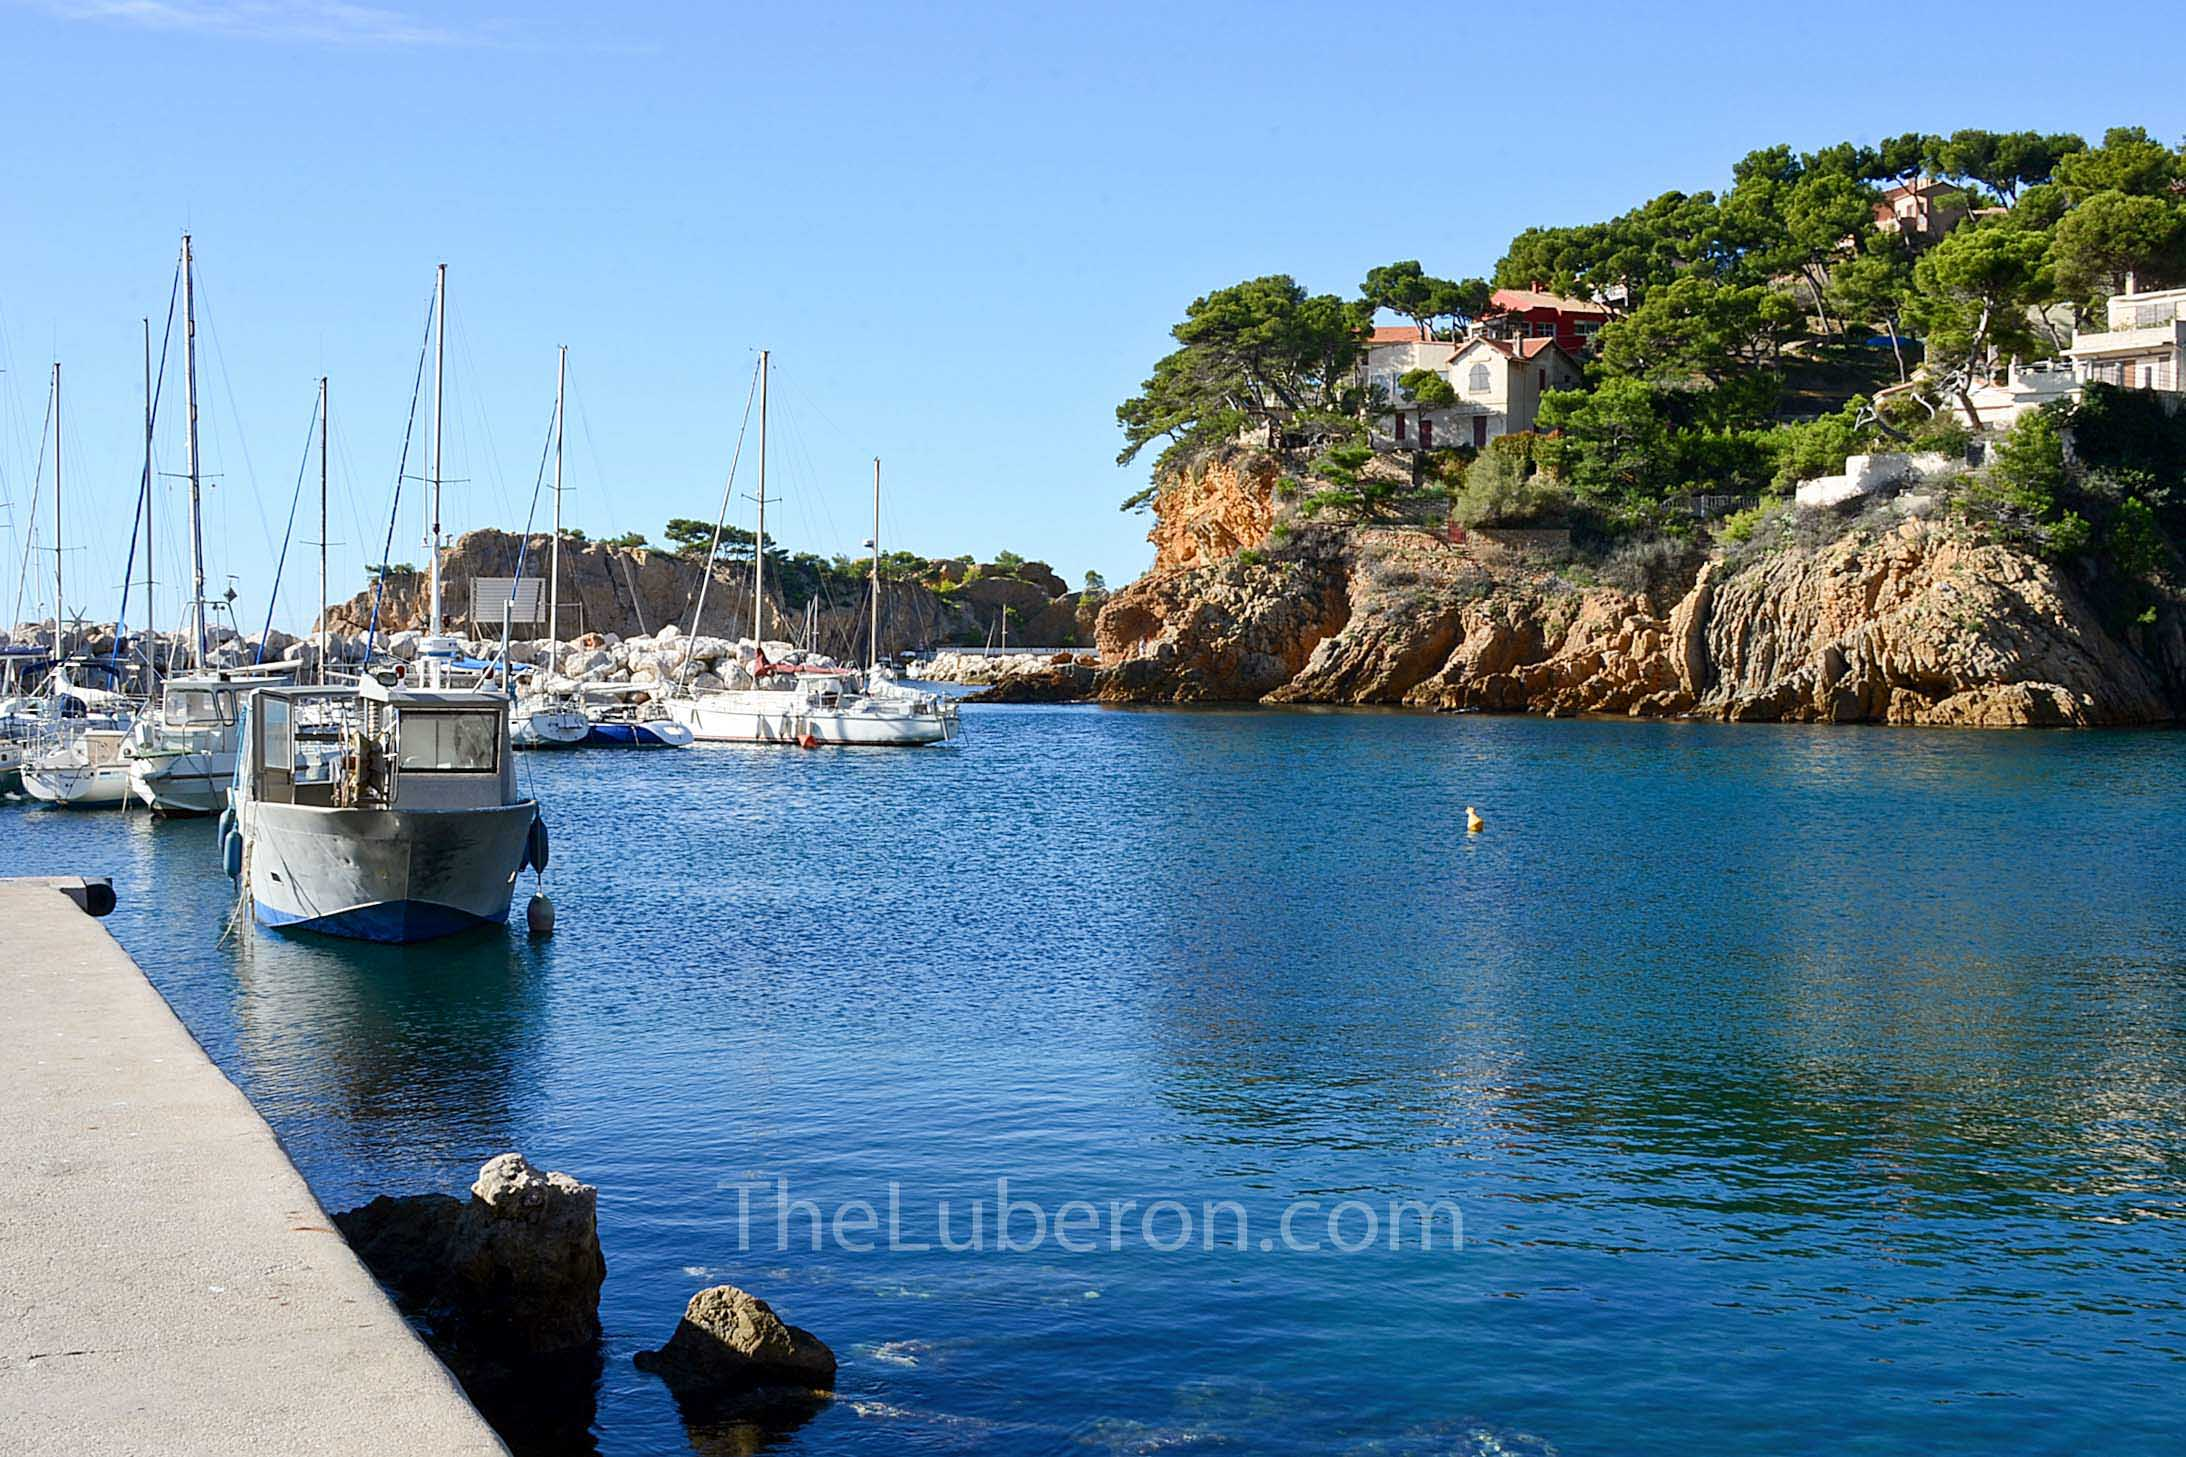 Boats in the harbour at Ensues-la-Redonne, Cote Bleue